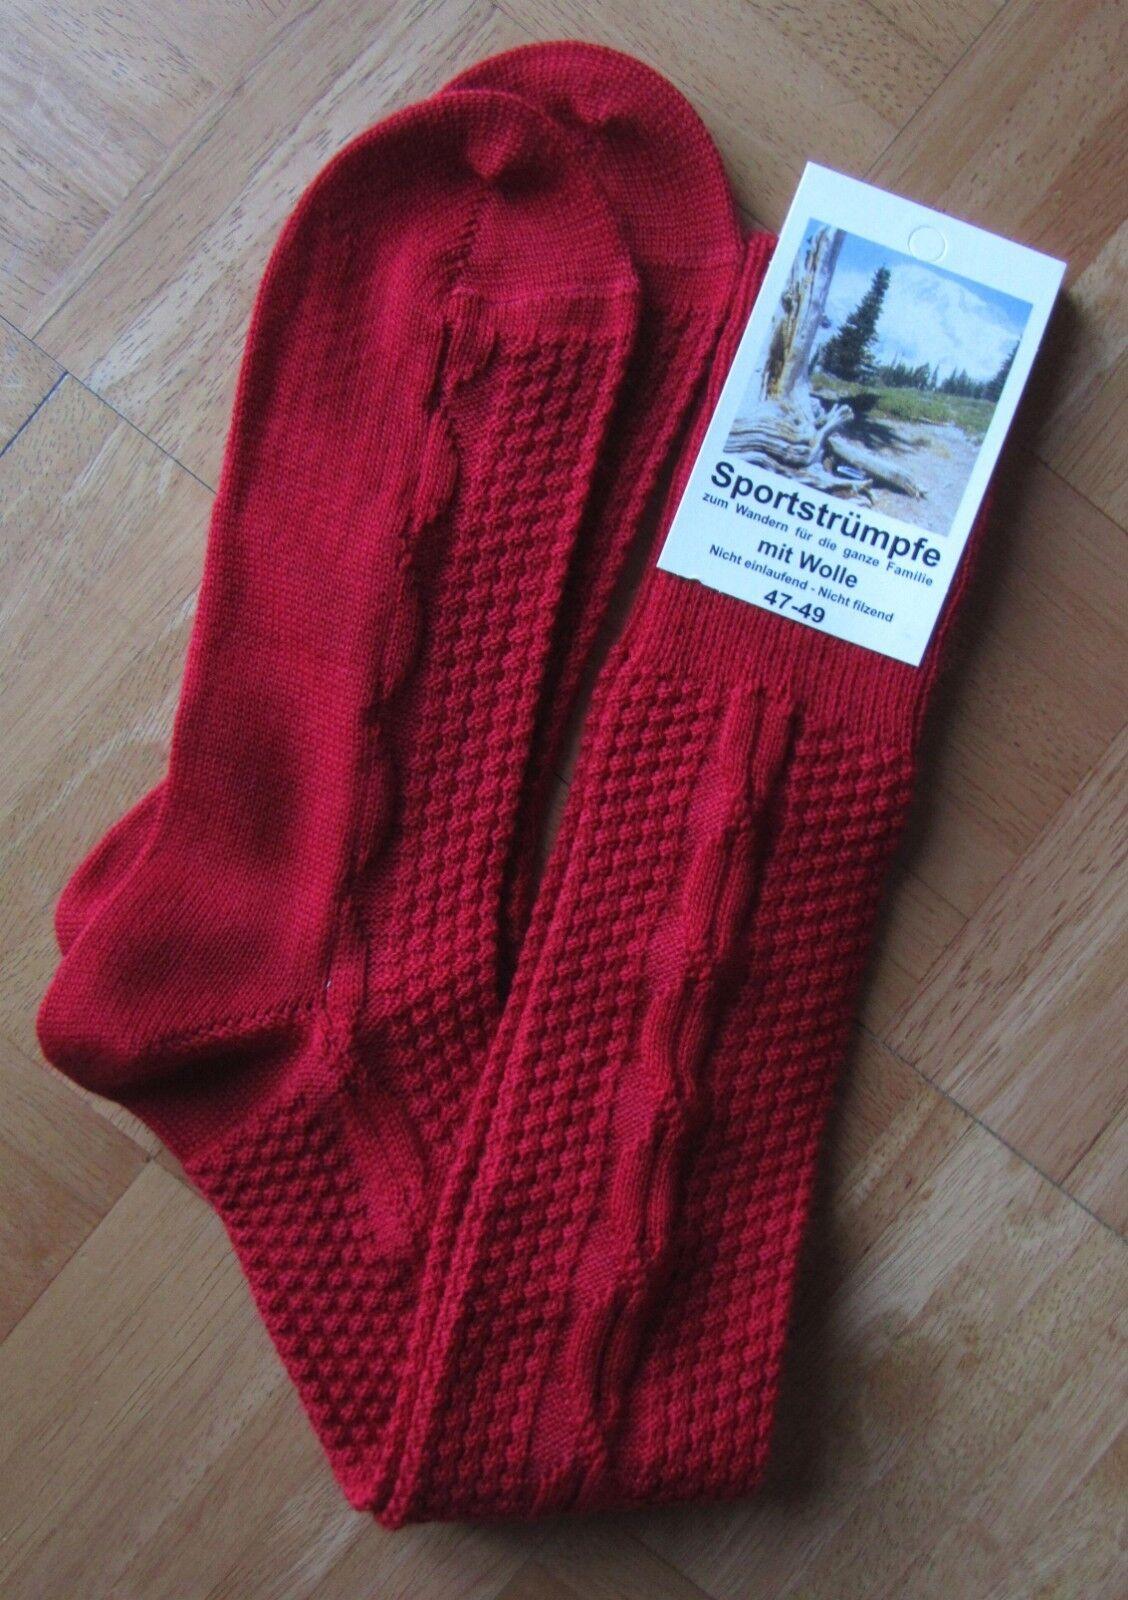 Lederhosen Socks Gents German Red Hunters Socks L-XL